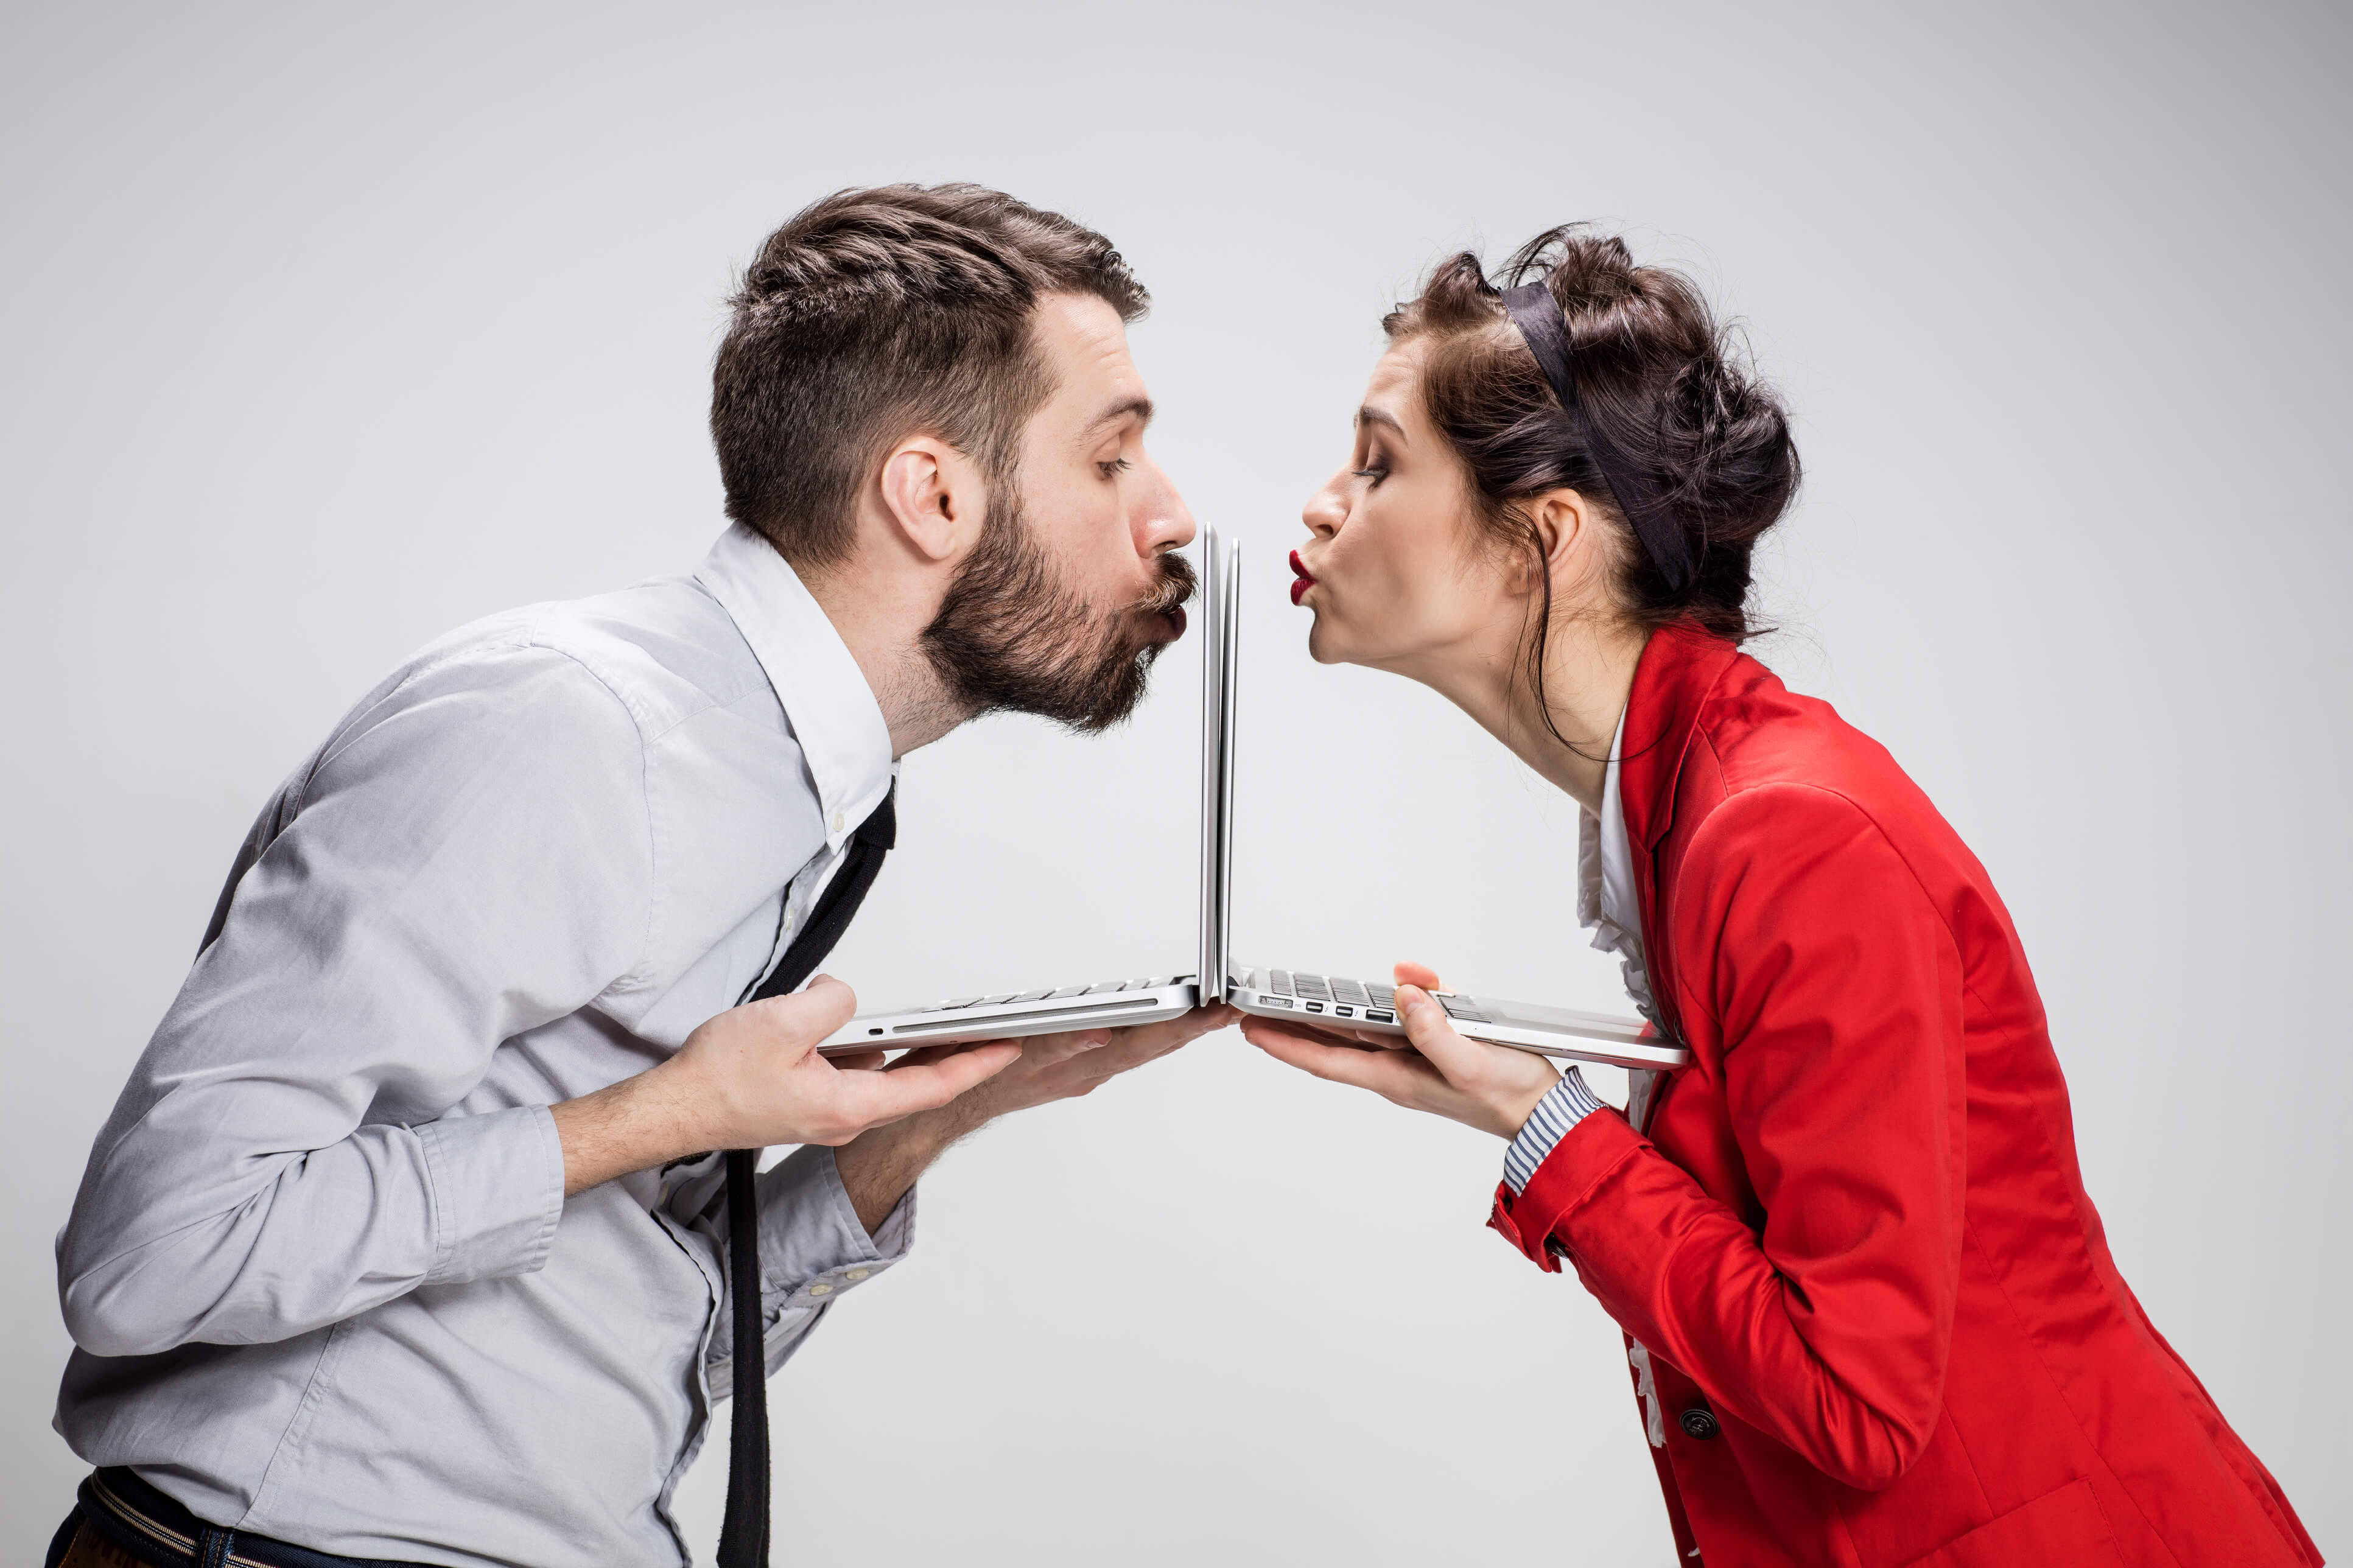 Voksen dating sites nz kuhmo alaston turku bezplatnoe porno swinger bileet pornokuvat.